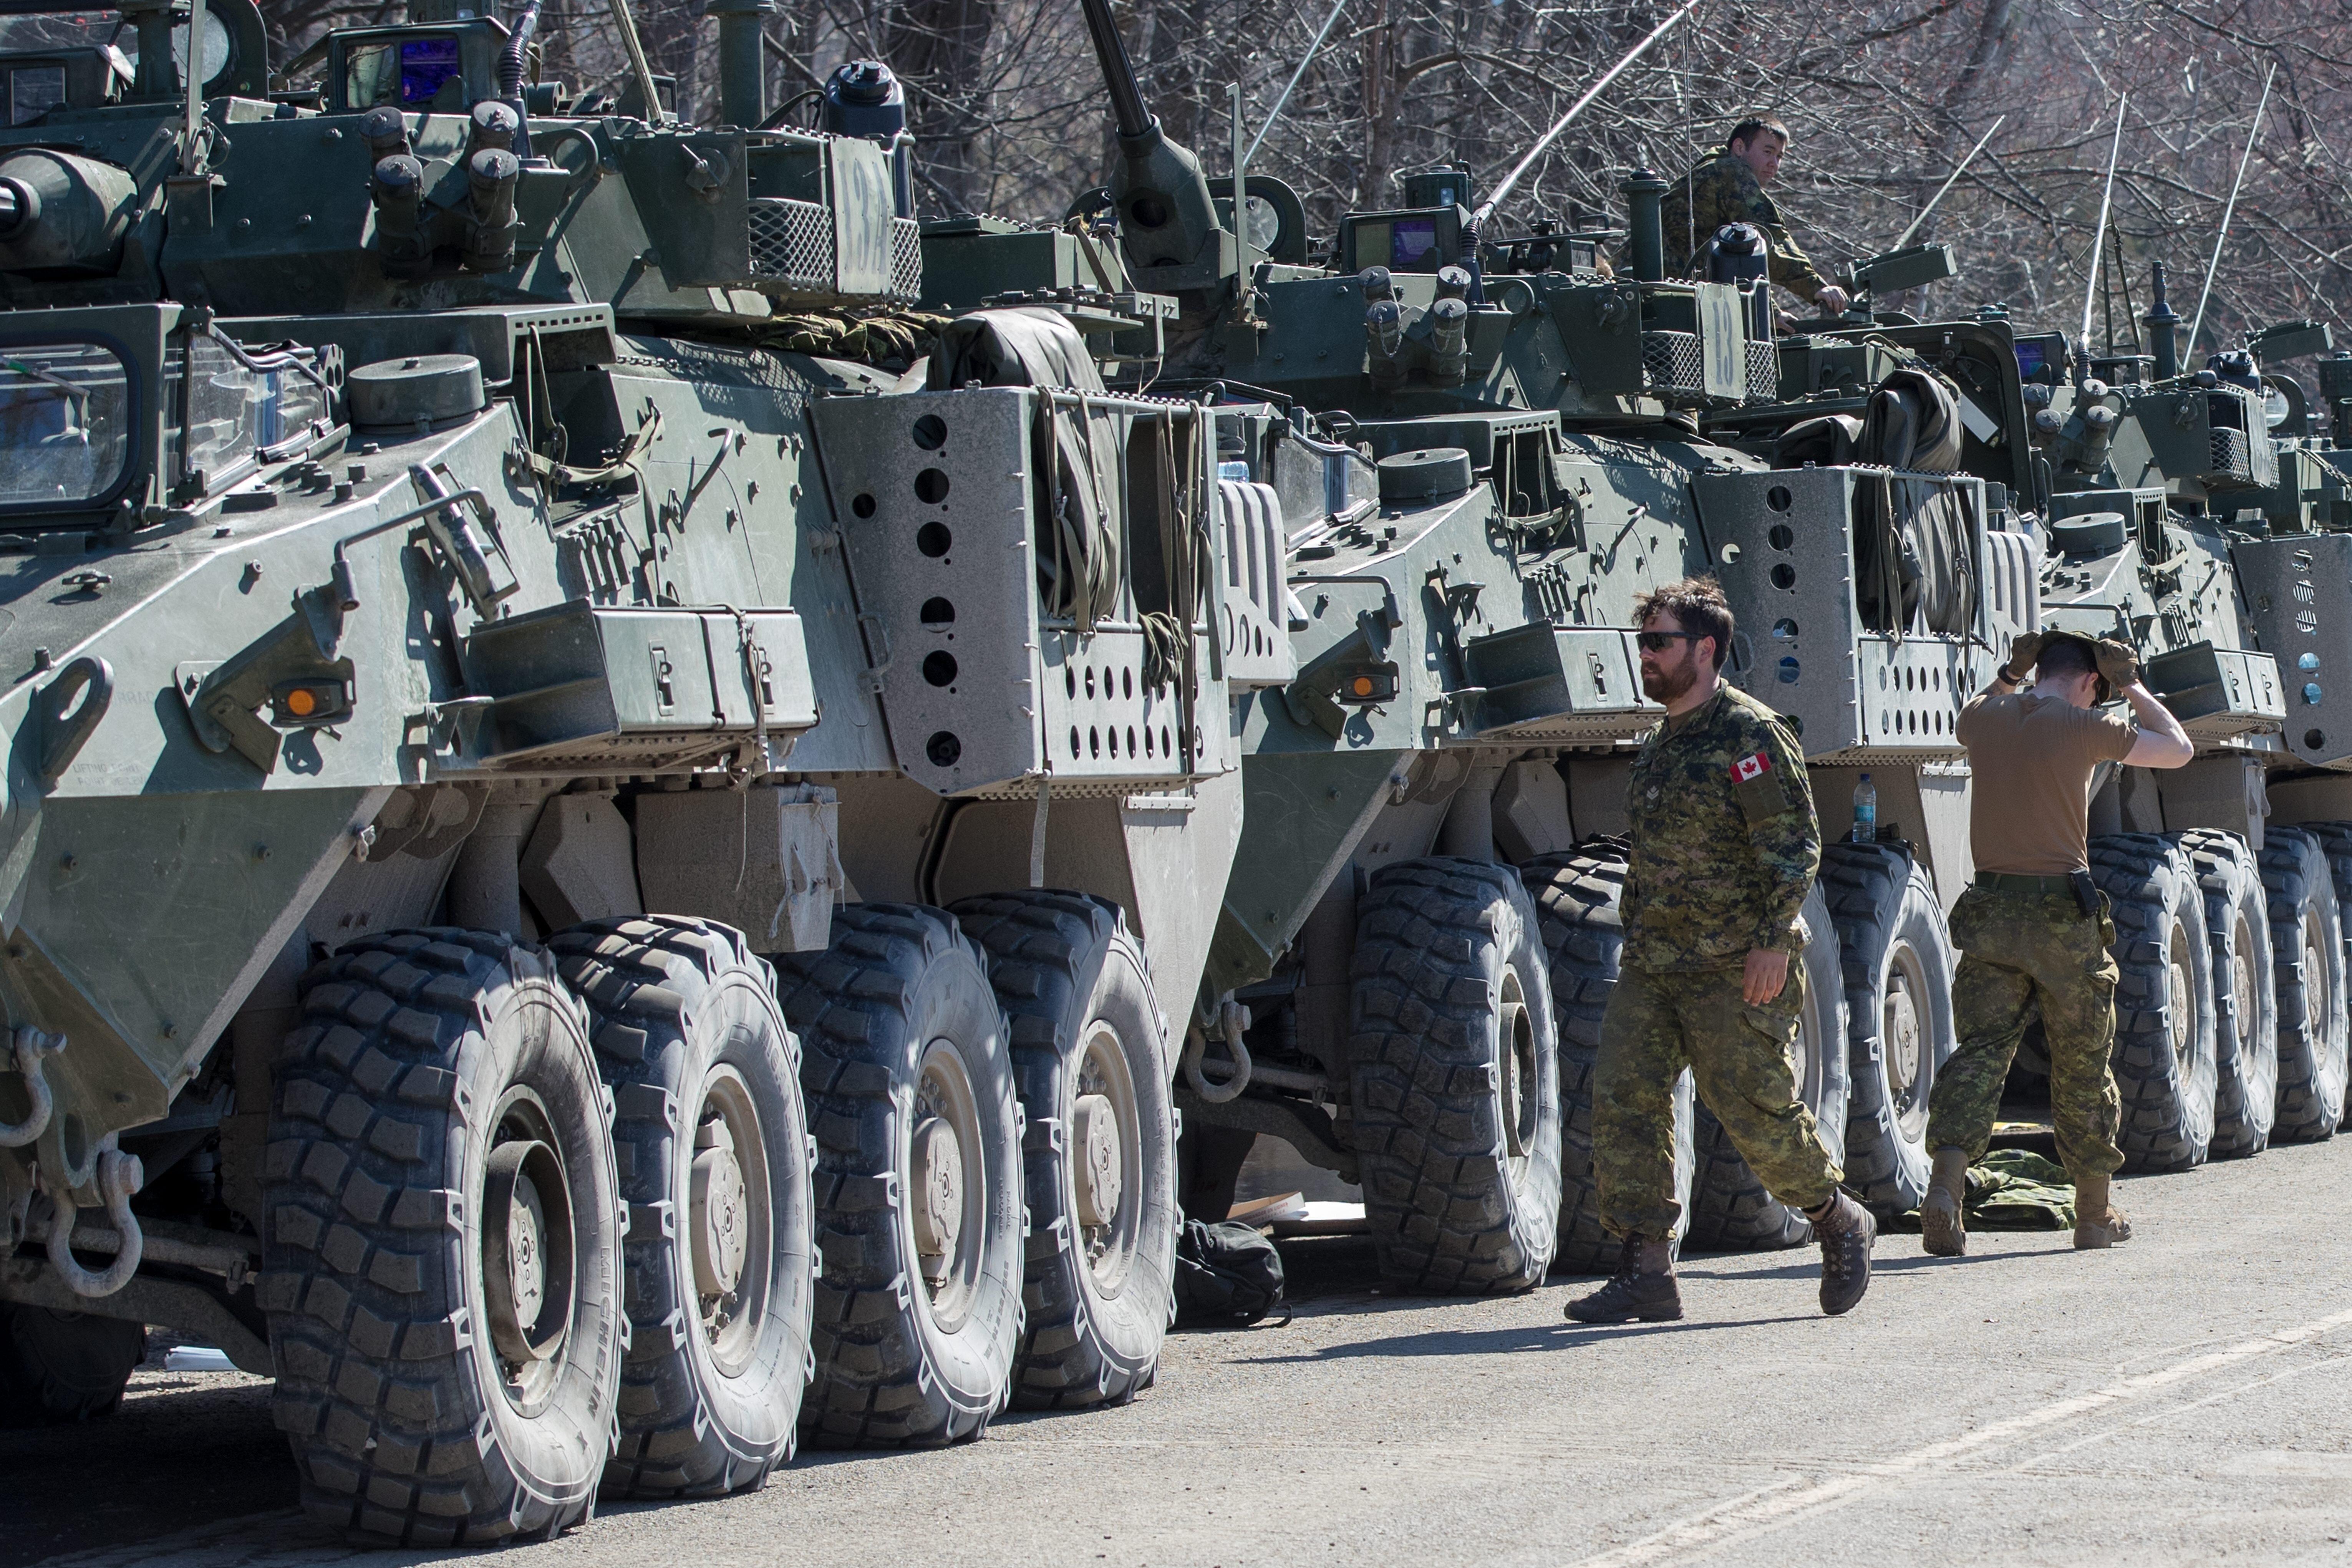 Inconduites sexuelles dans l'armée: peu de